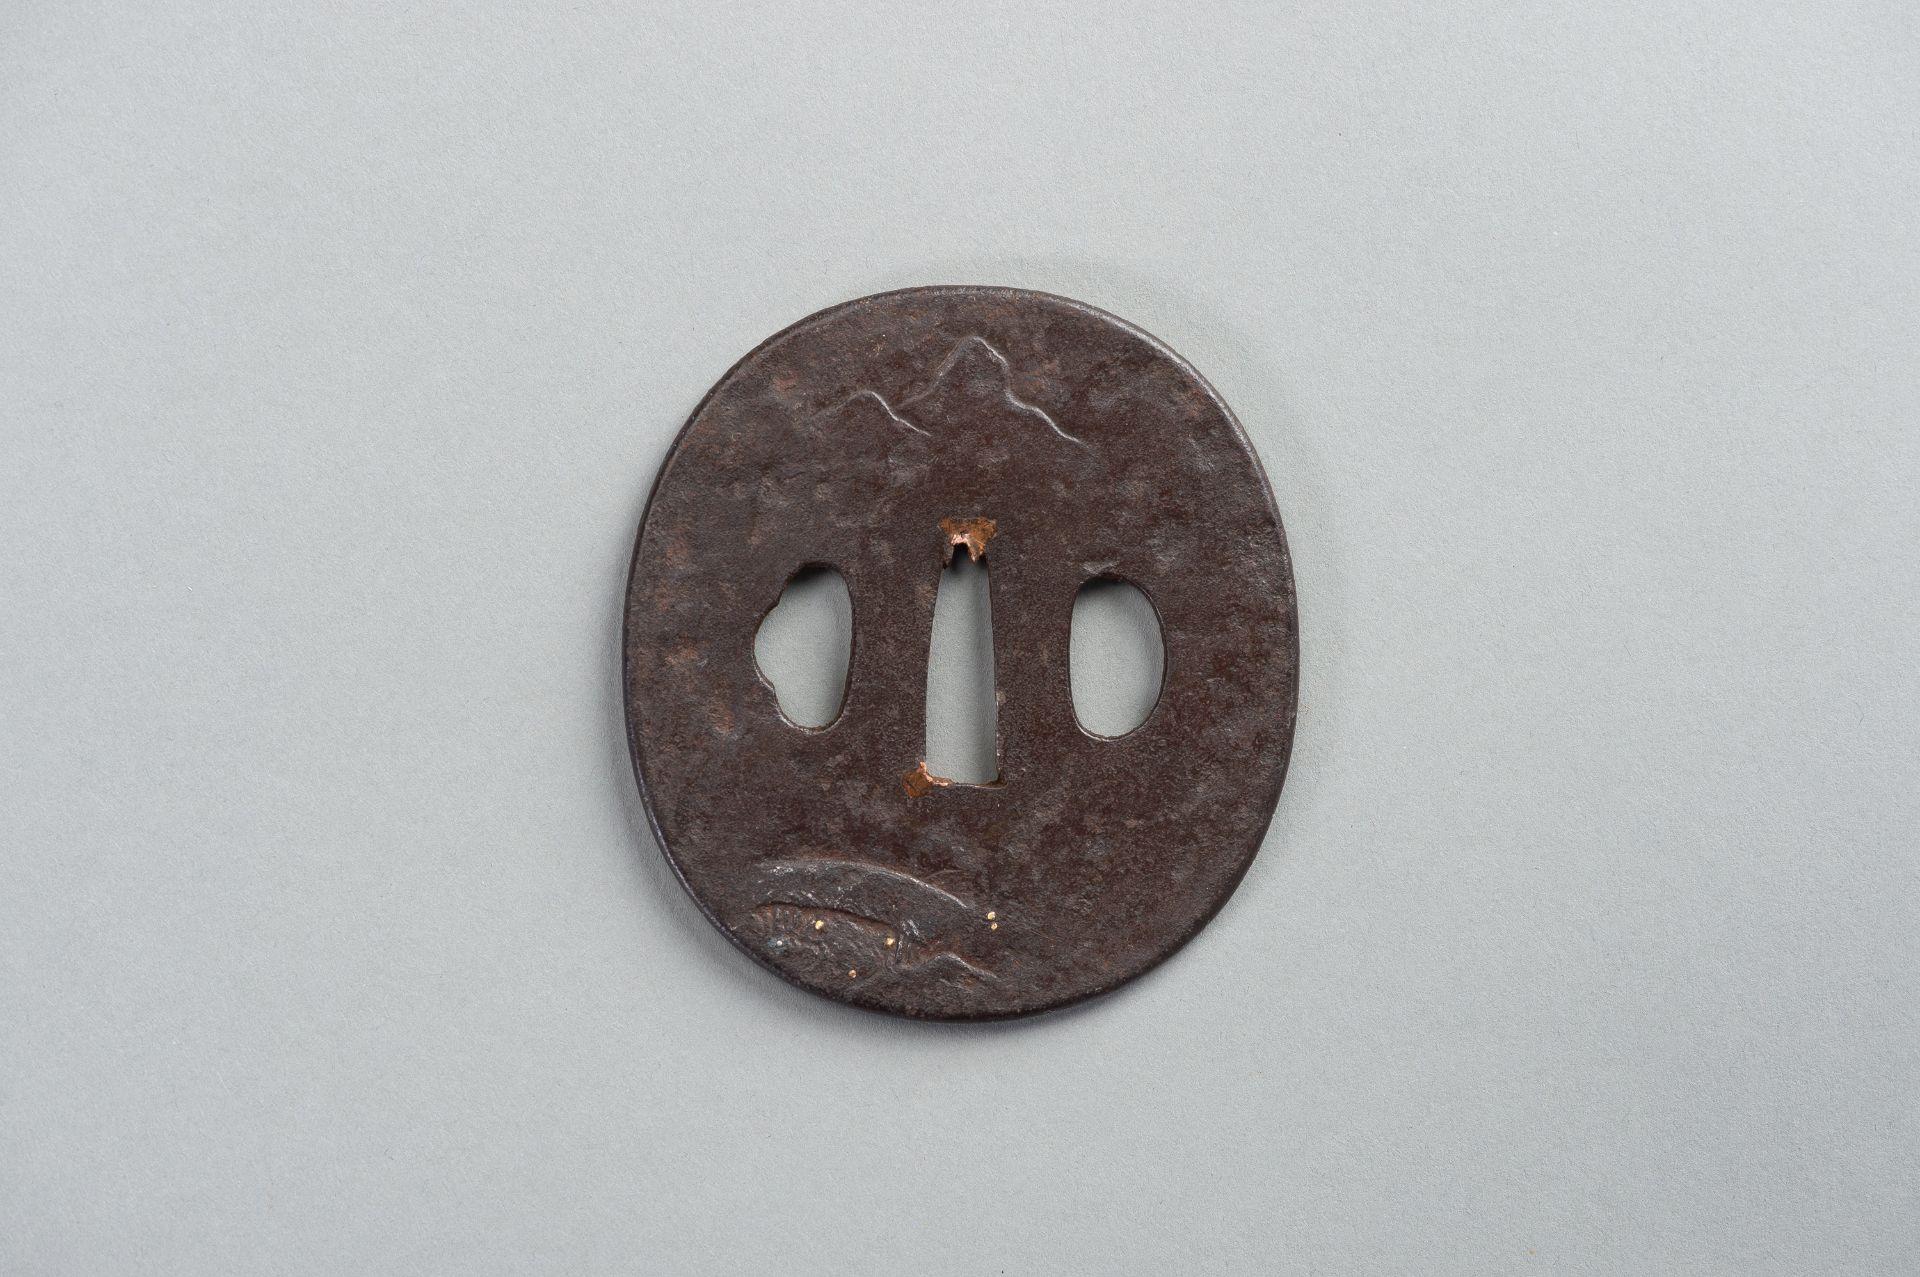 AN IRON TSUBA WITH A LITERATI